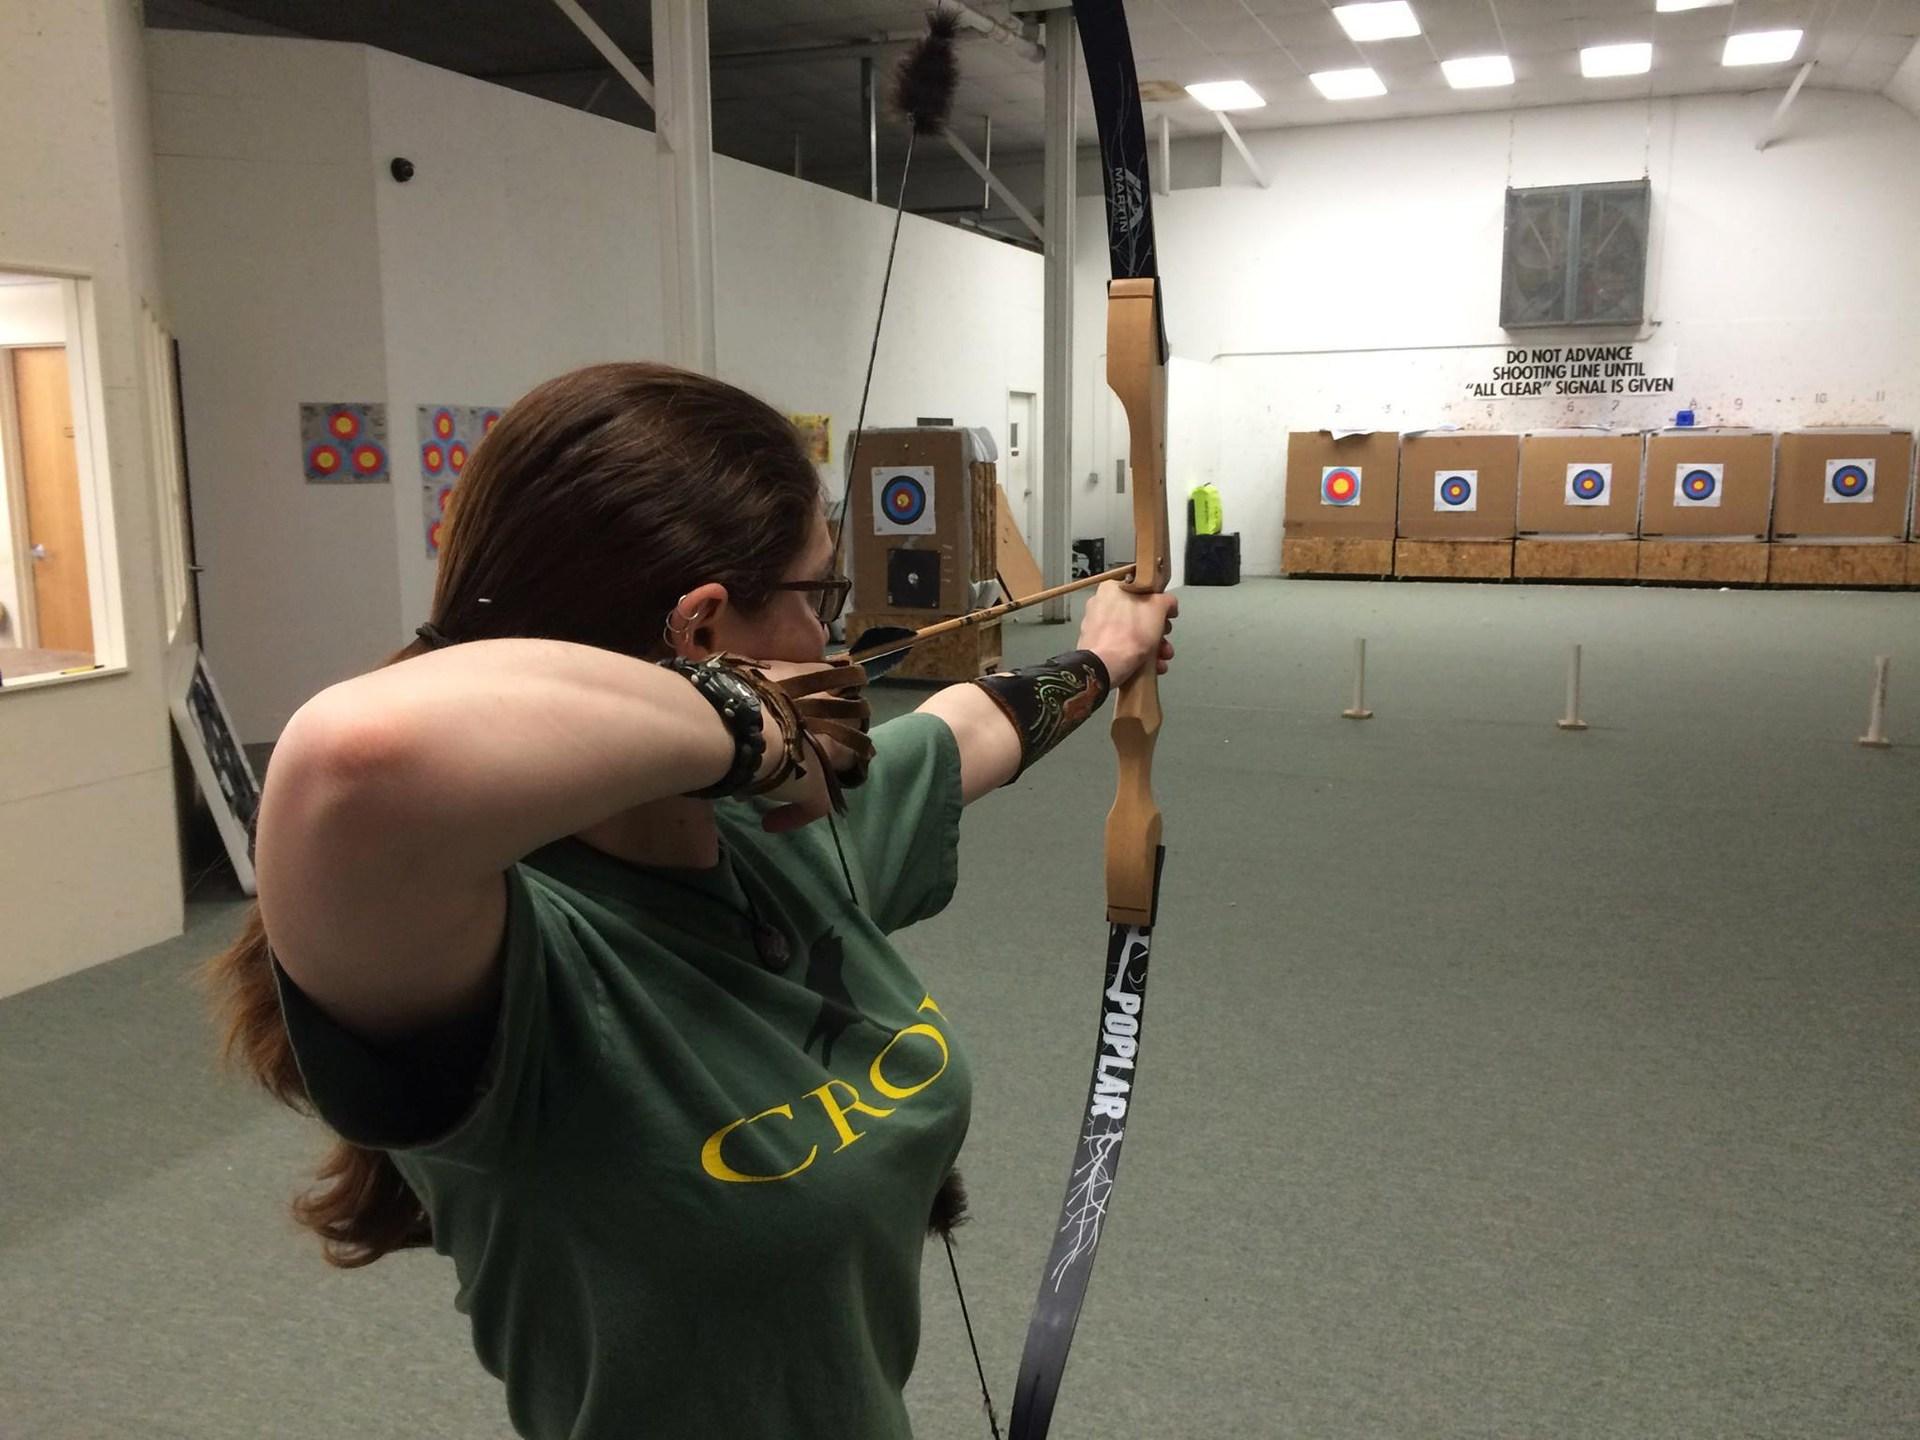 I do traditional/bare bow archery as a hobby.